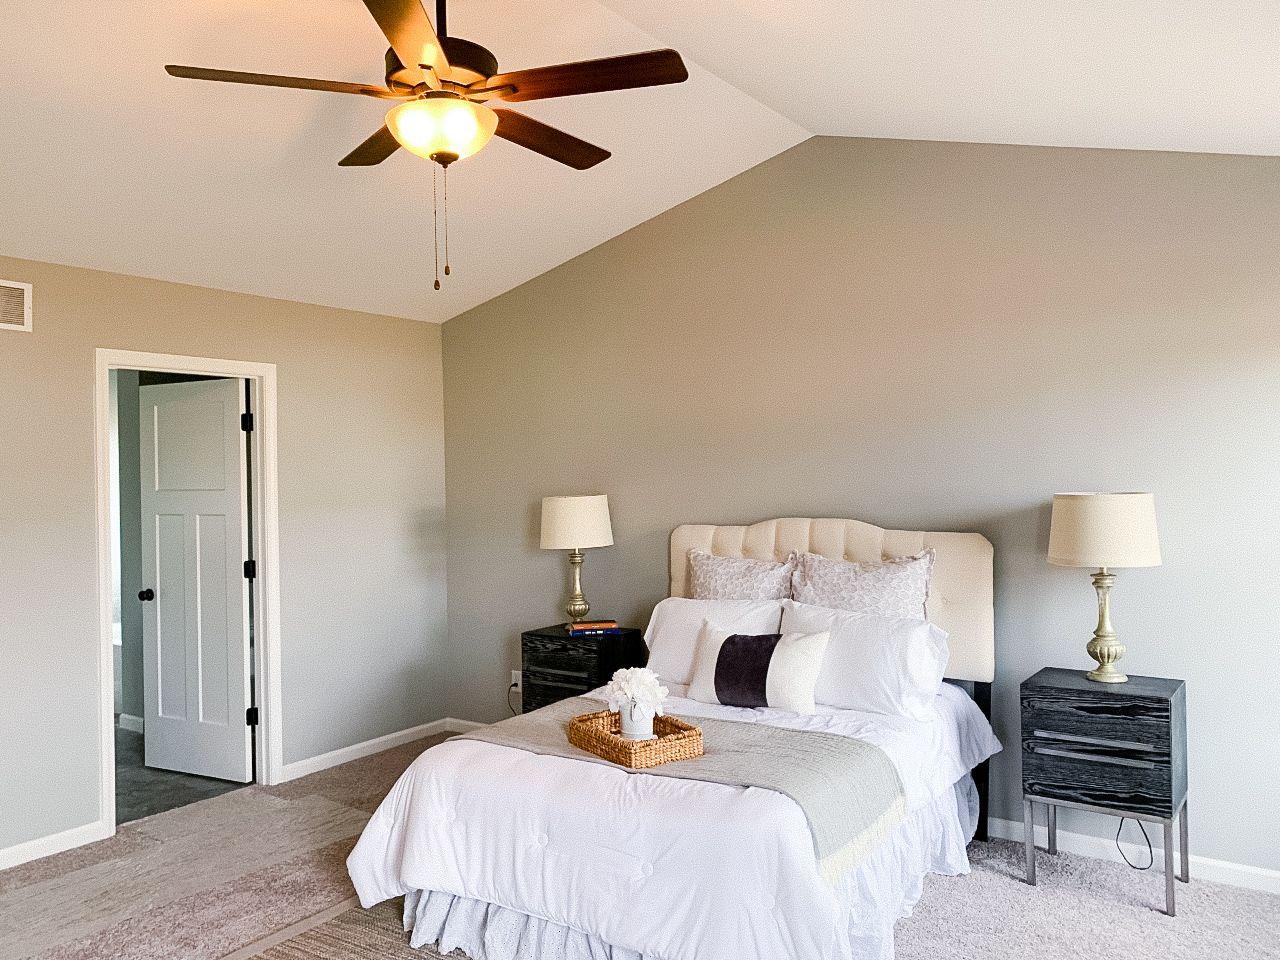 Bedroom featured in the Prescott B By C.A. Jones, Inc.  in St. Louis, IL